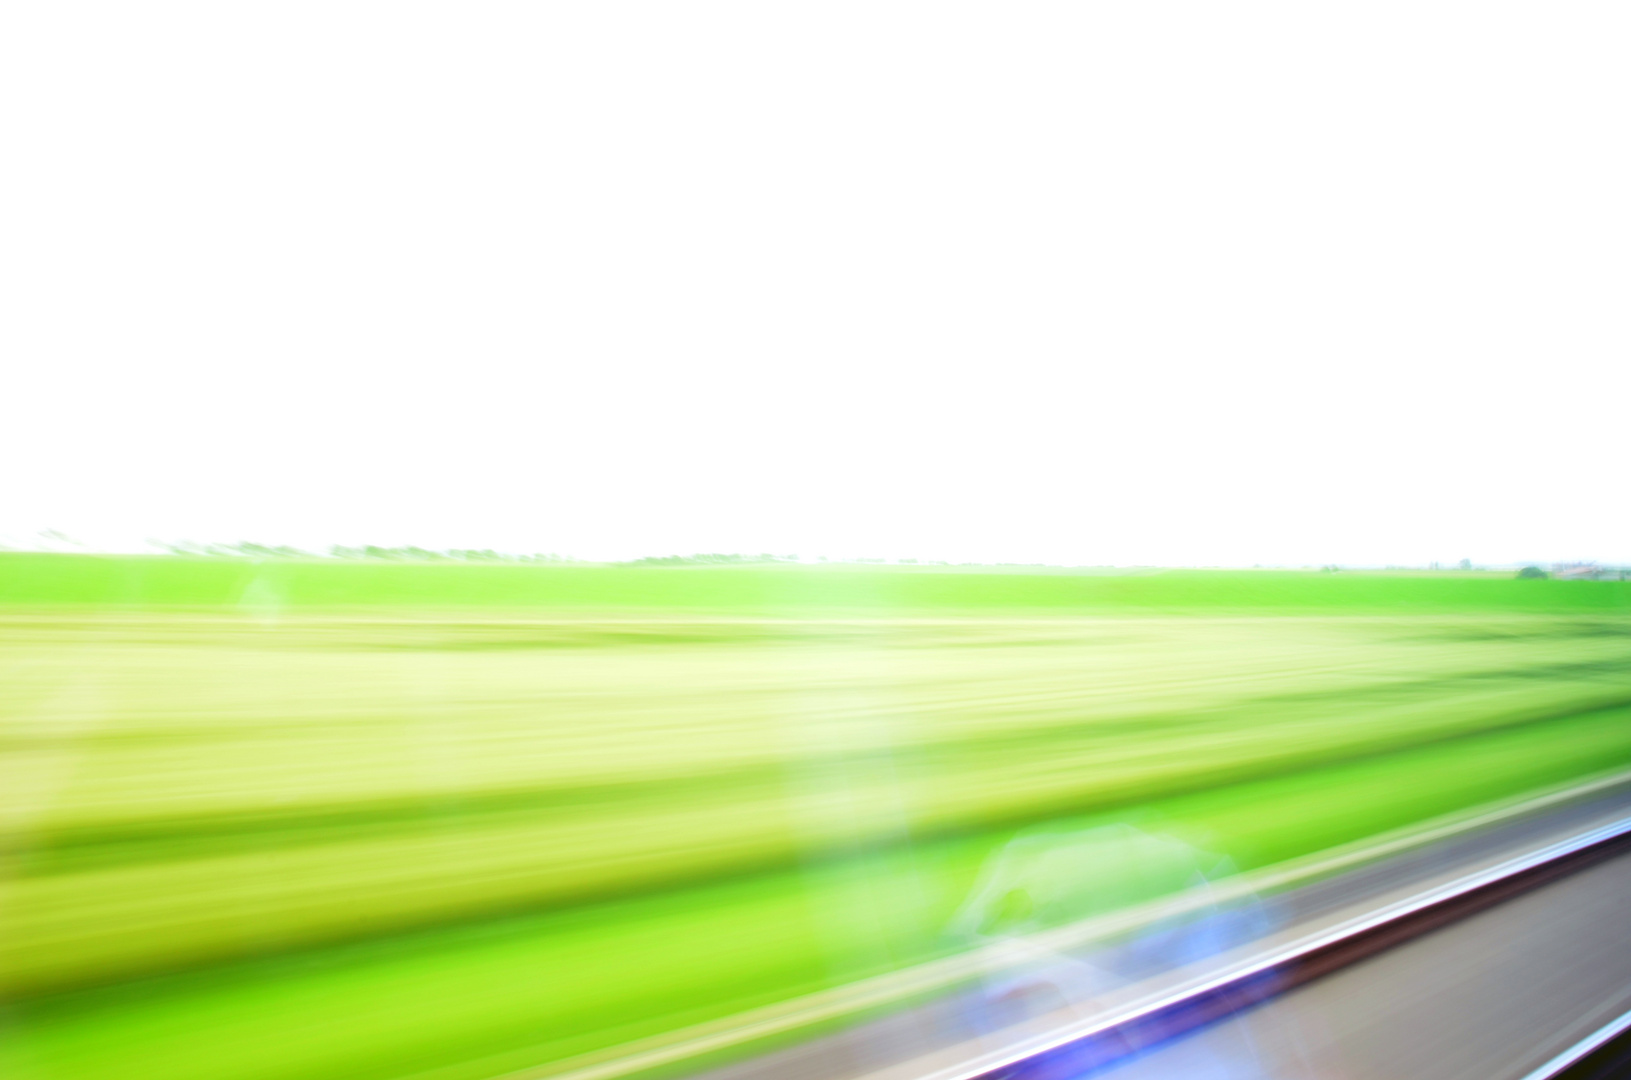 Zugfahrt im Grünen